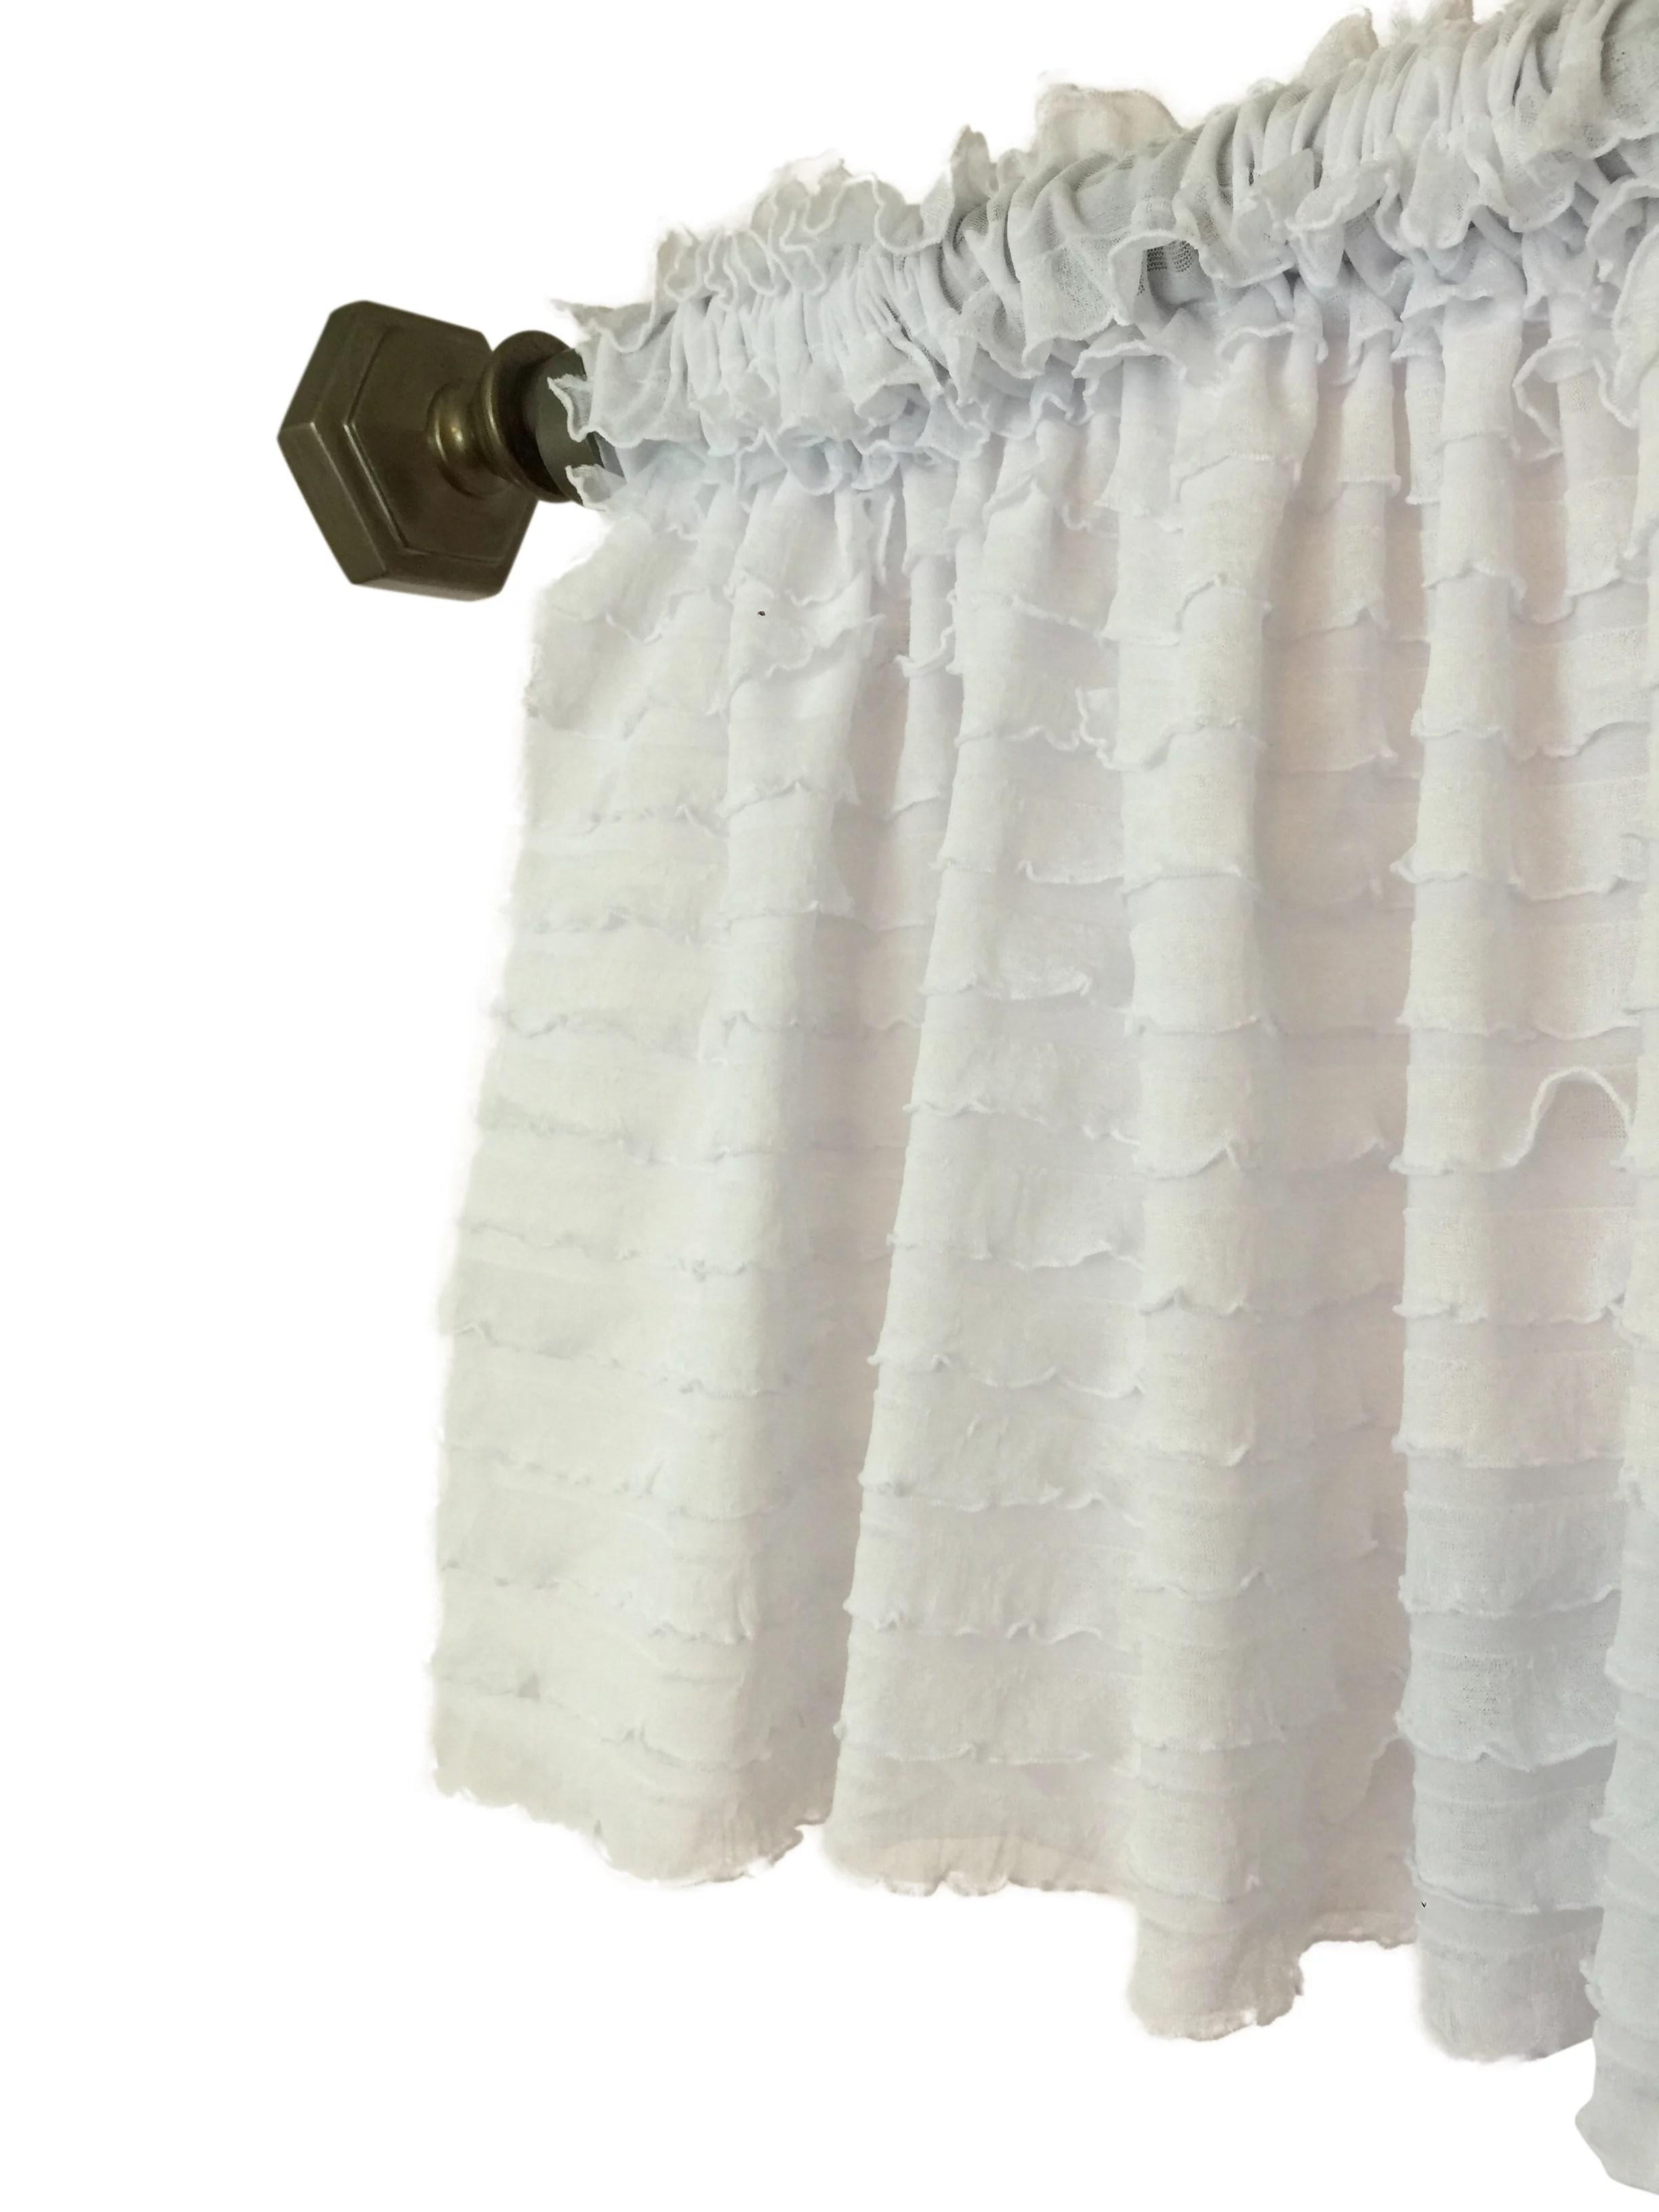 white ruffle valance sheer curtain window treatment for home decor kitchen nursery office bedroom